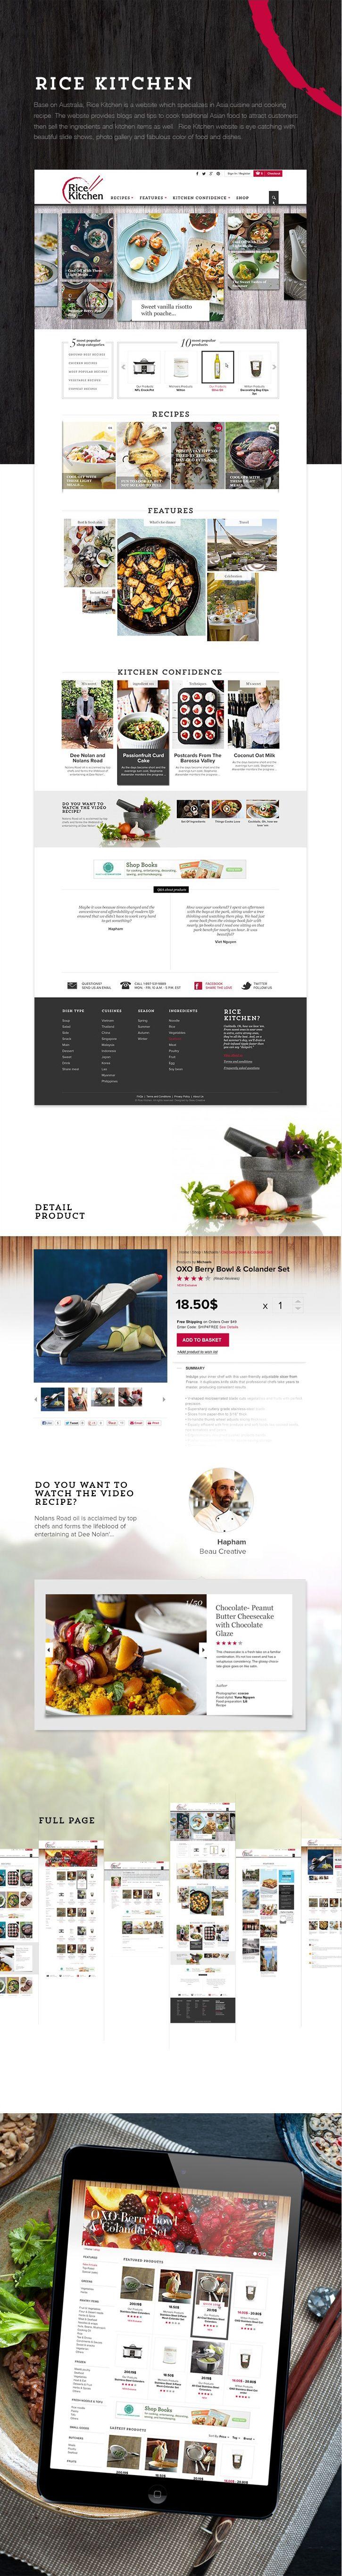 Rice Kitchen #website #web #restaurant #asian #shop #ecommerce #food